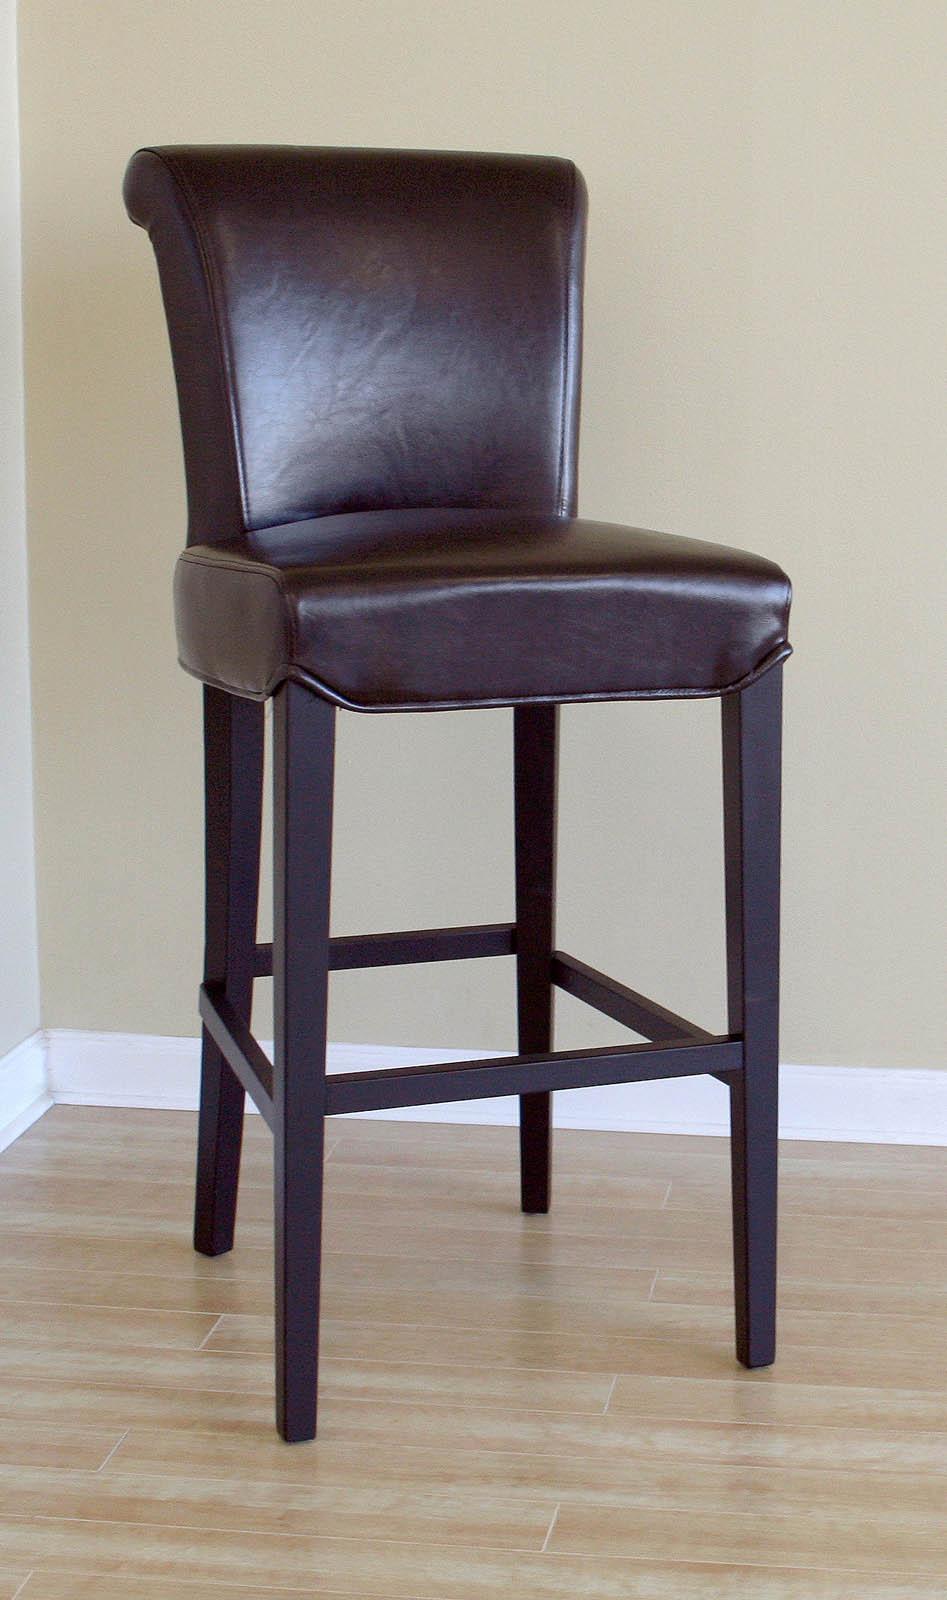 Julian dark brown full leather bar stools set of 2 in for Dark wood bar stools